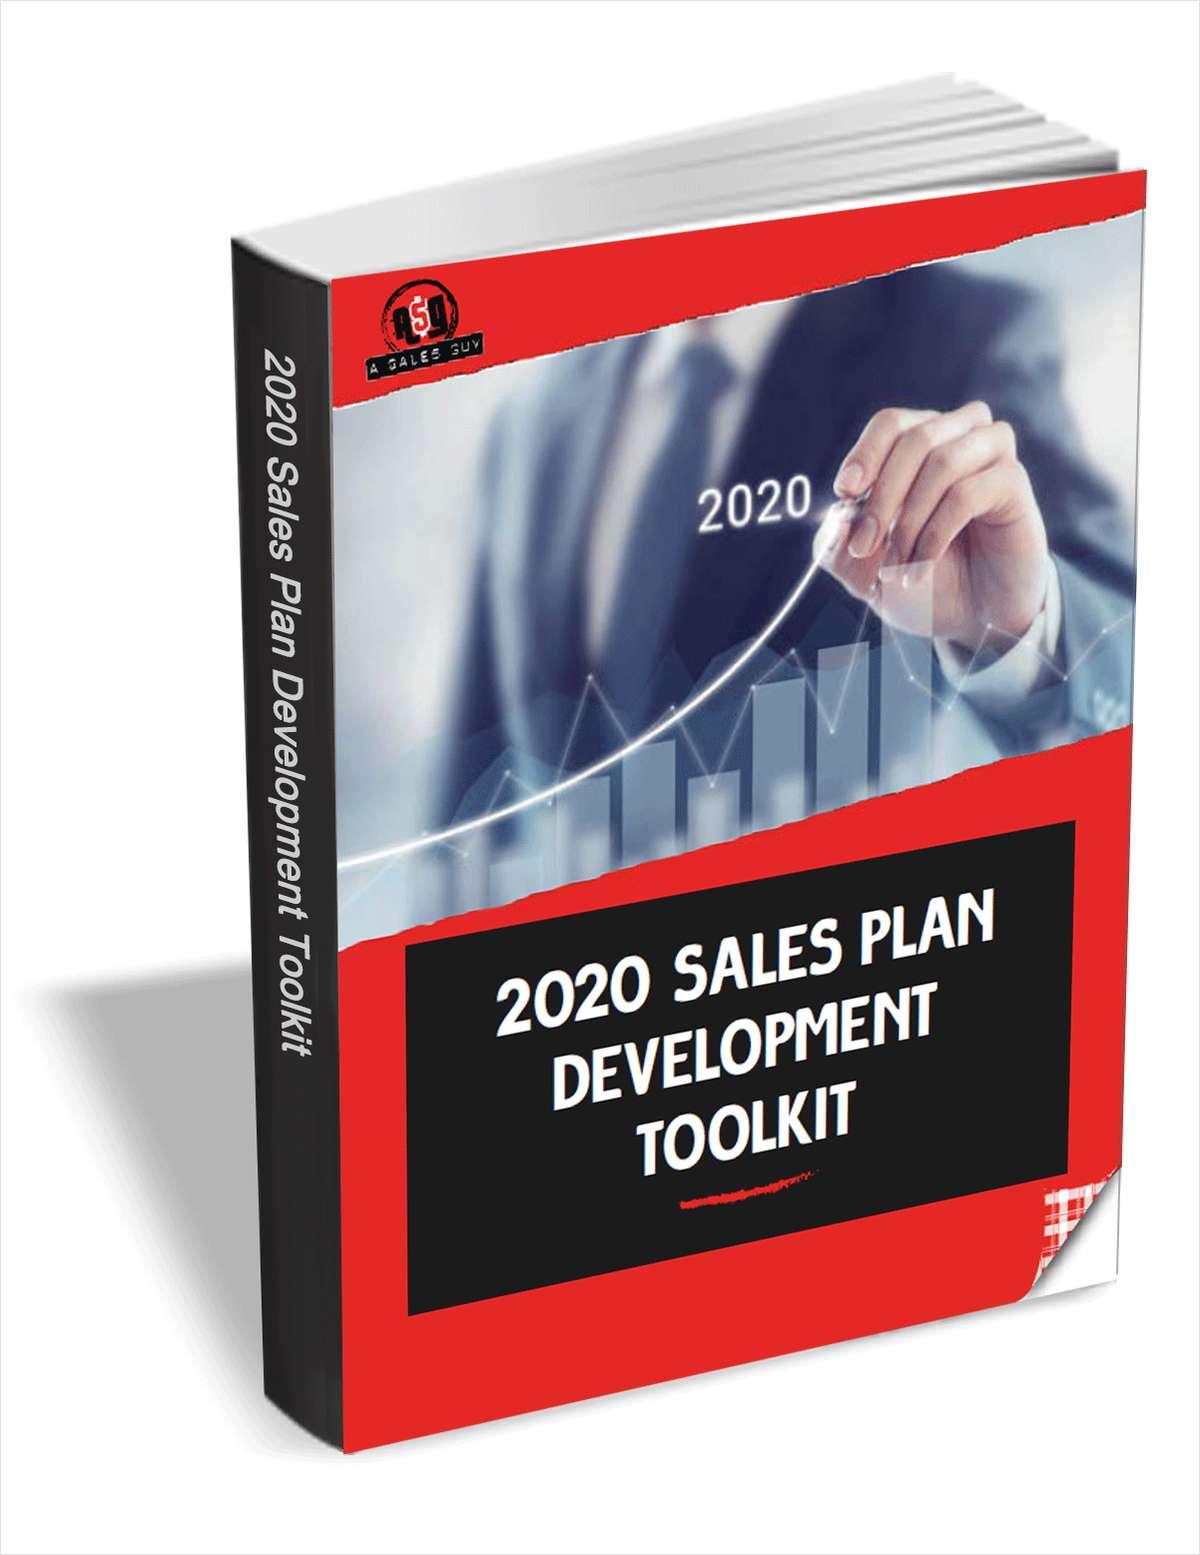 2020 Sales Plan Development Toolkit